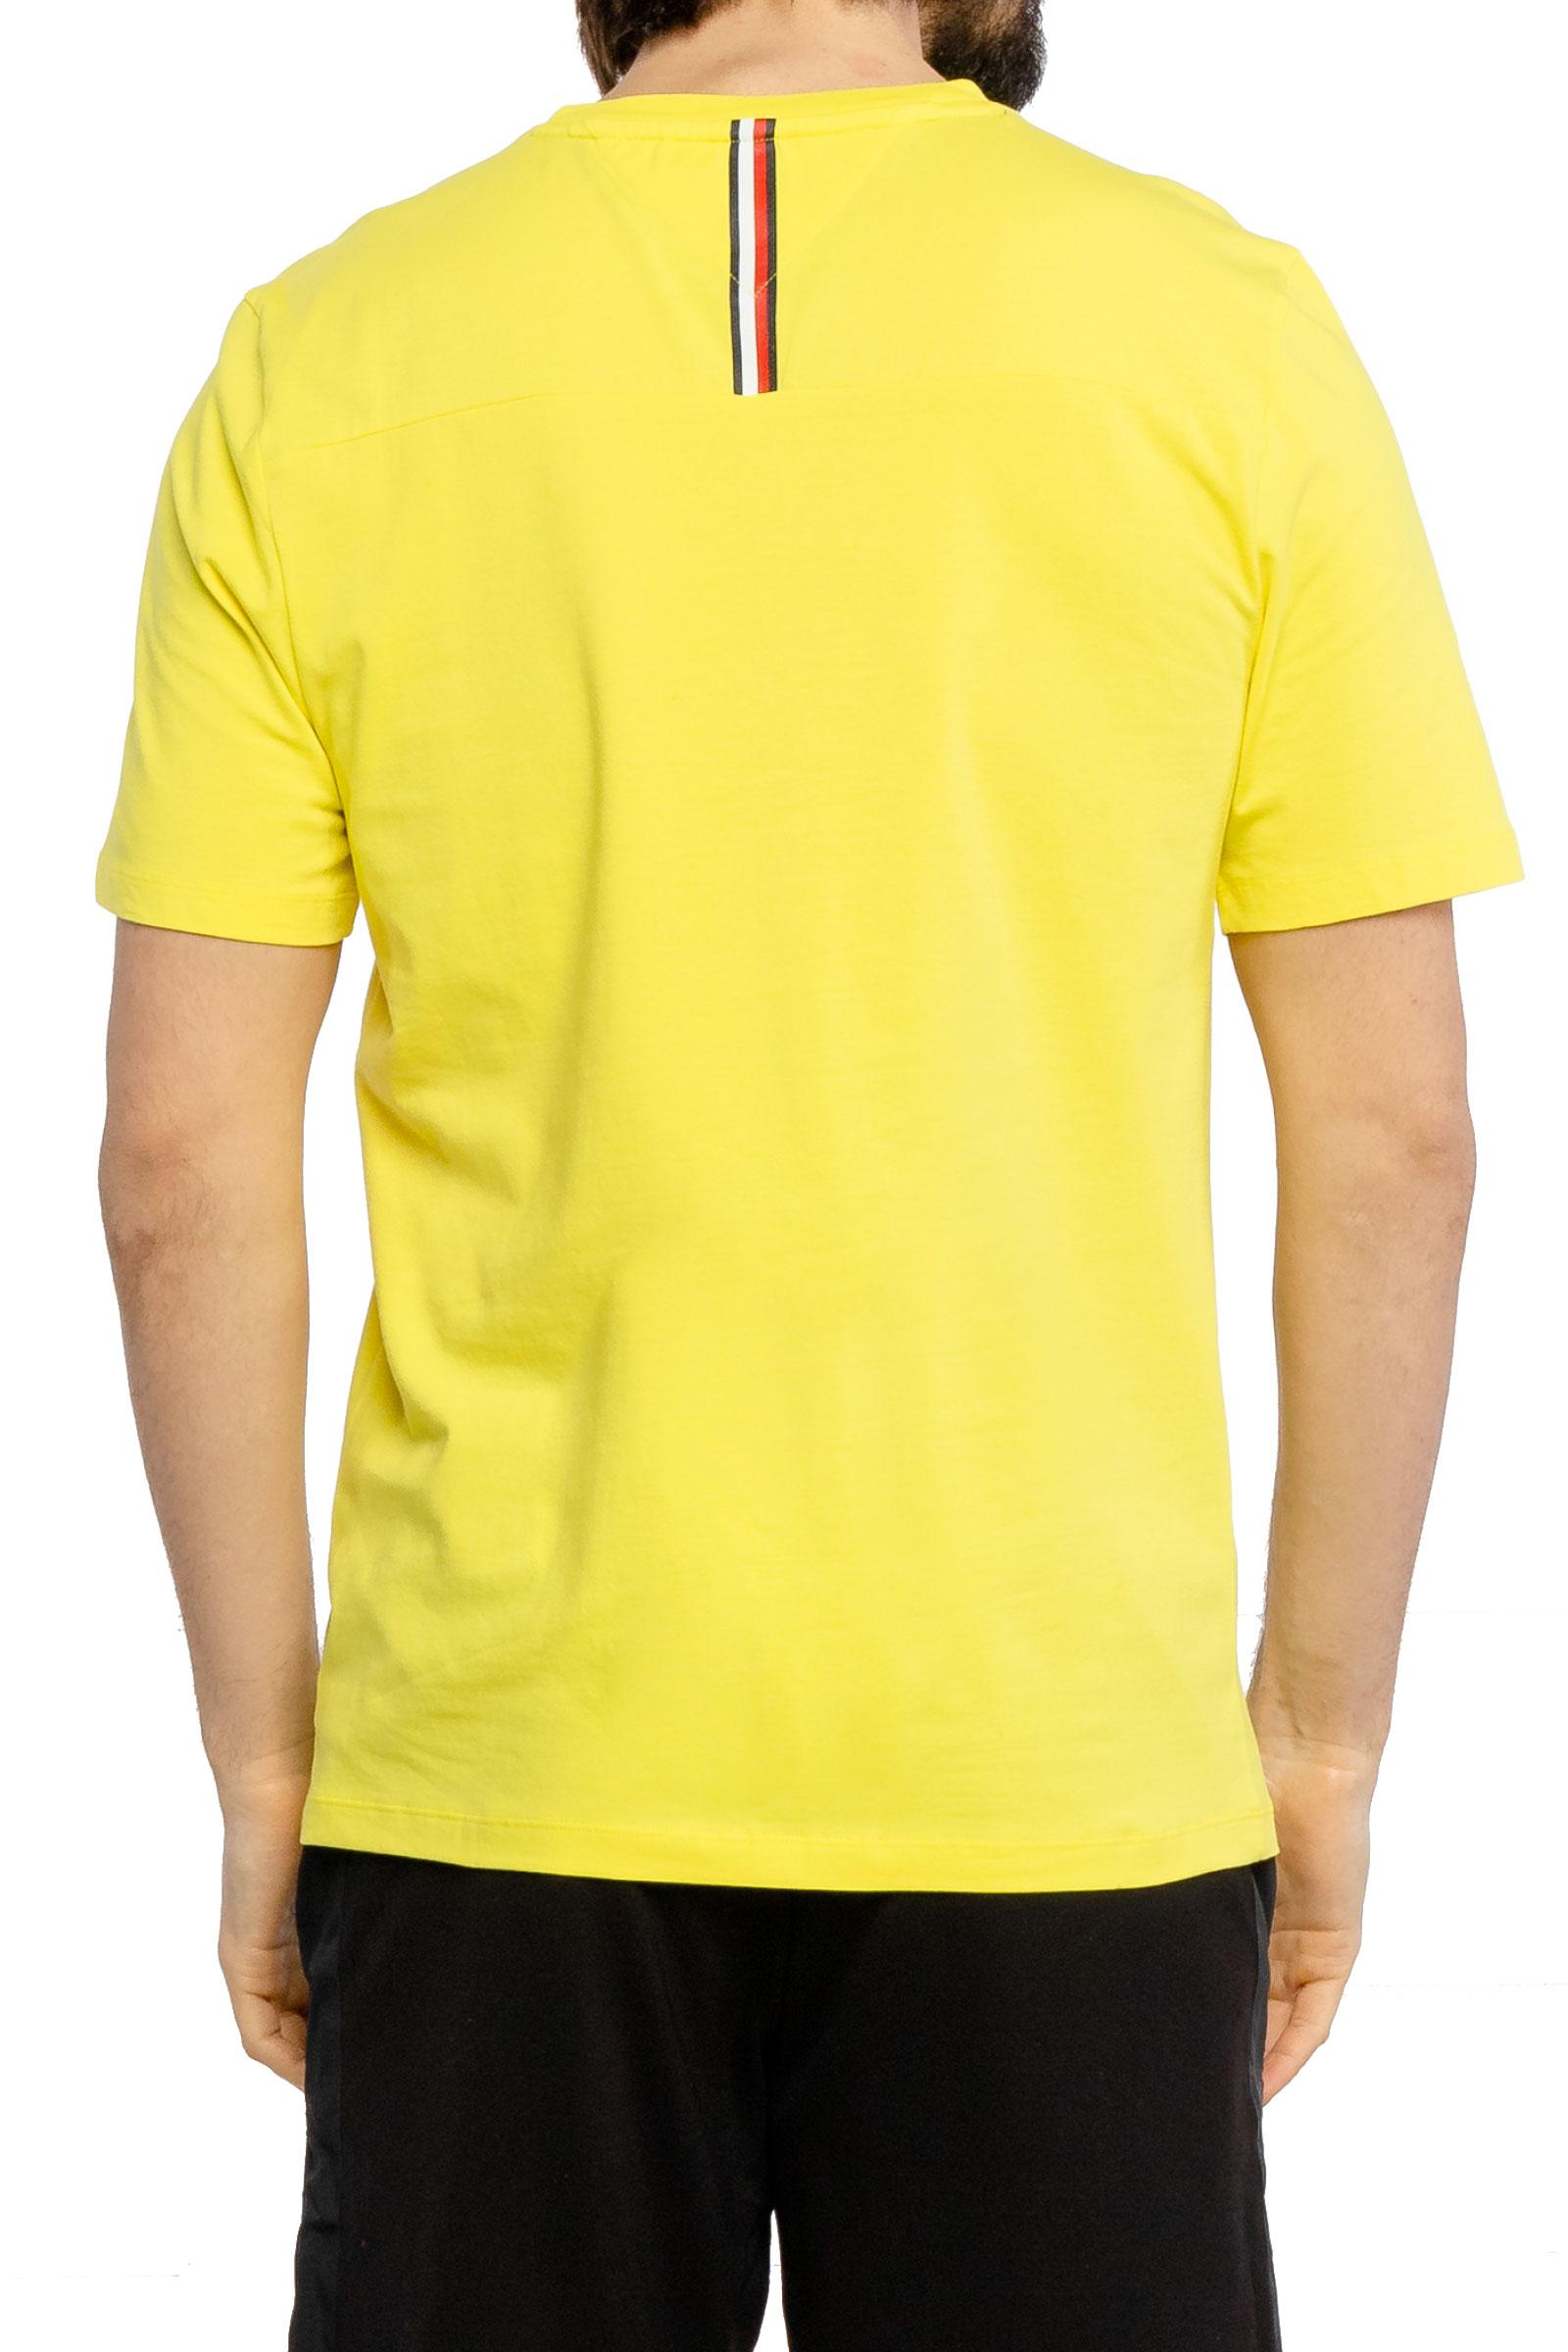 TOMMY HILFIGER T-Shirt Uomo TOMMY HILFIGER   T-Shirt   MW0MW17373ZIK